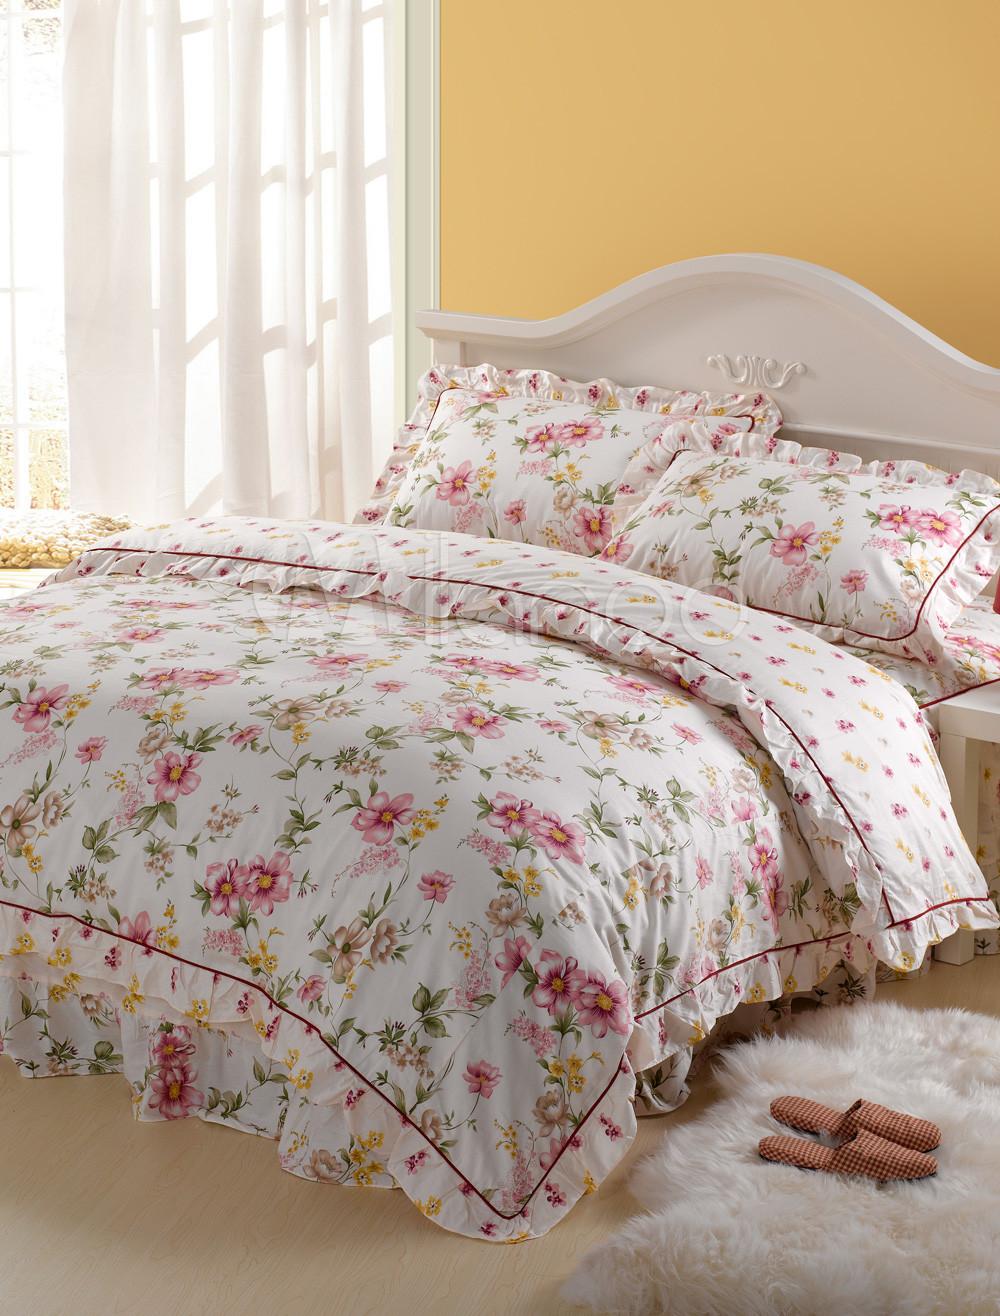 romantische 4 teilig pink floral cotton bettw sche set. Black Bedroom Furniture Sets. Home Design Ideas